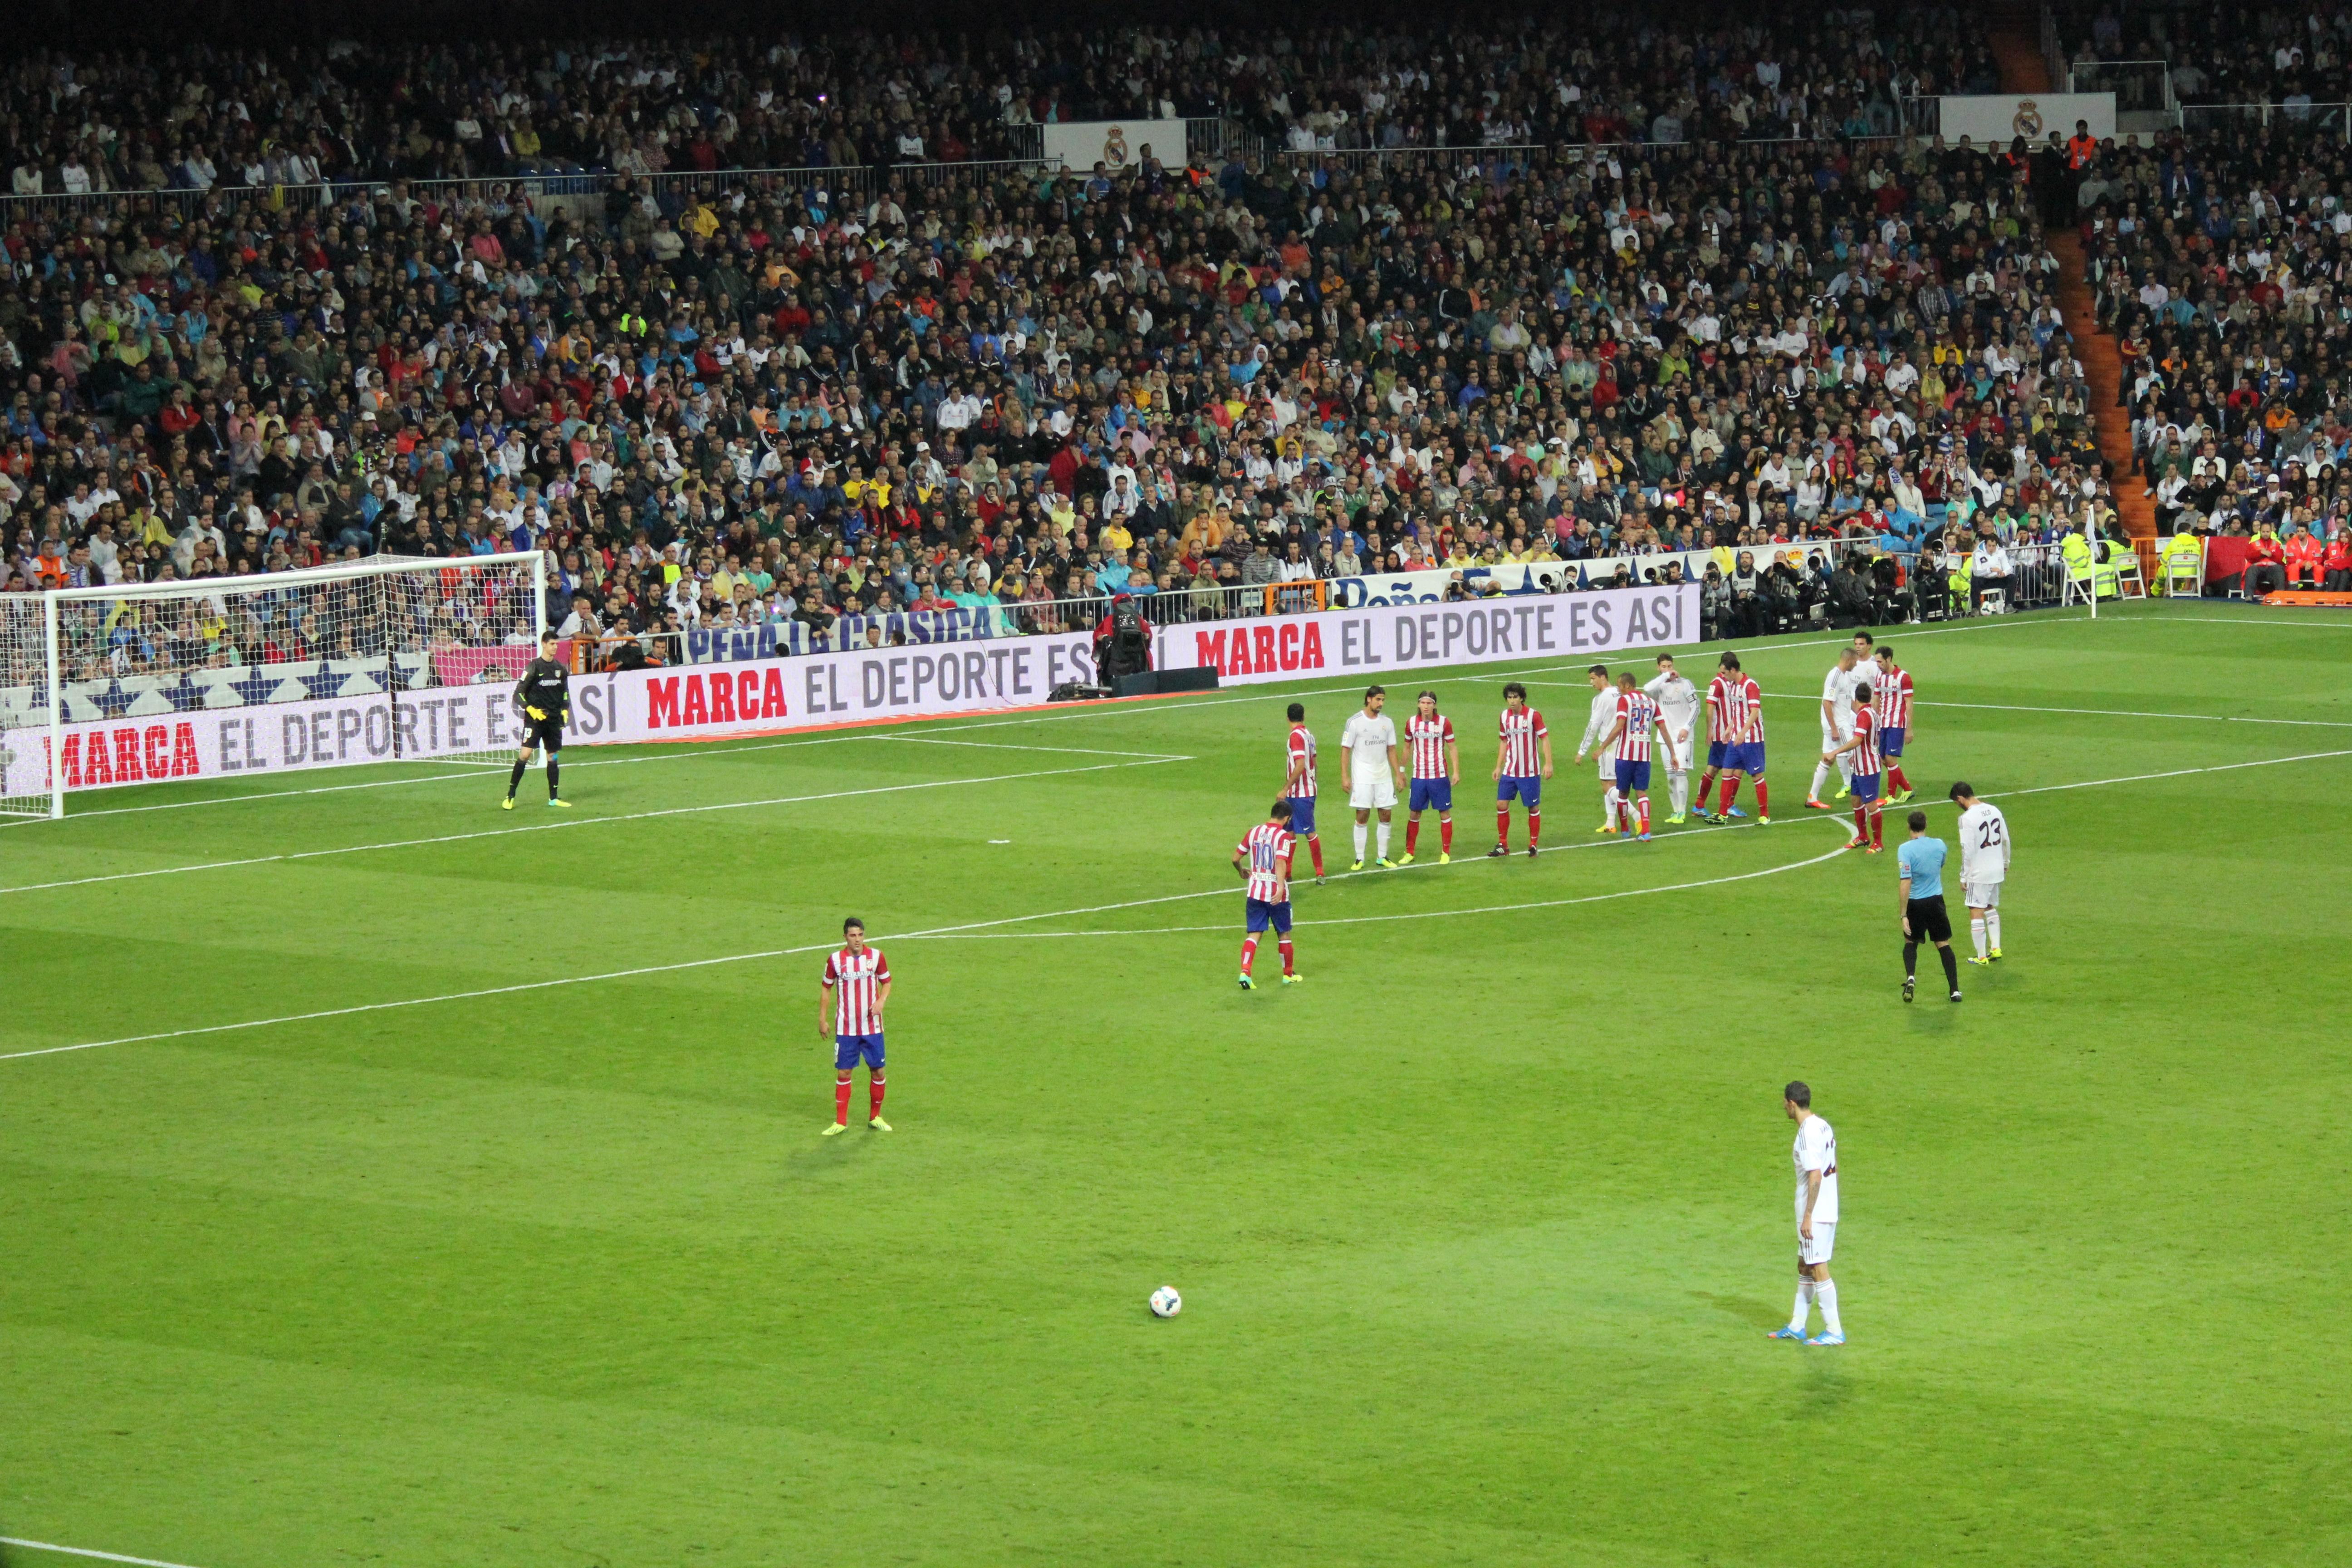 Image Result For Vivo Alemania Vs Espana En Vivo Direct